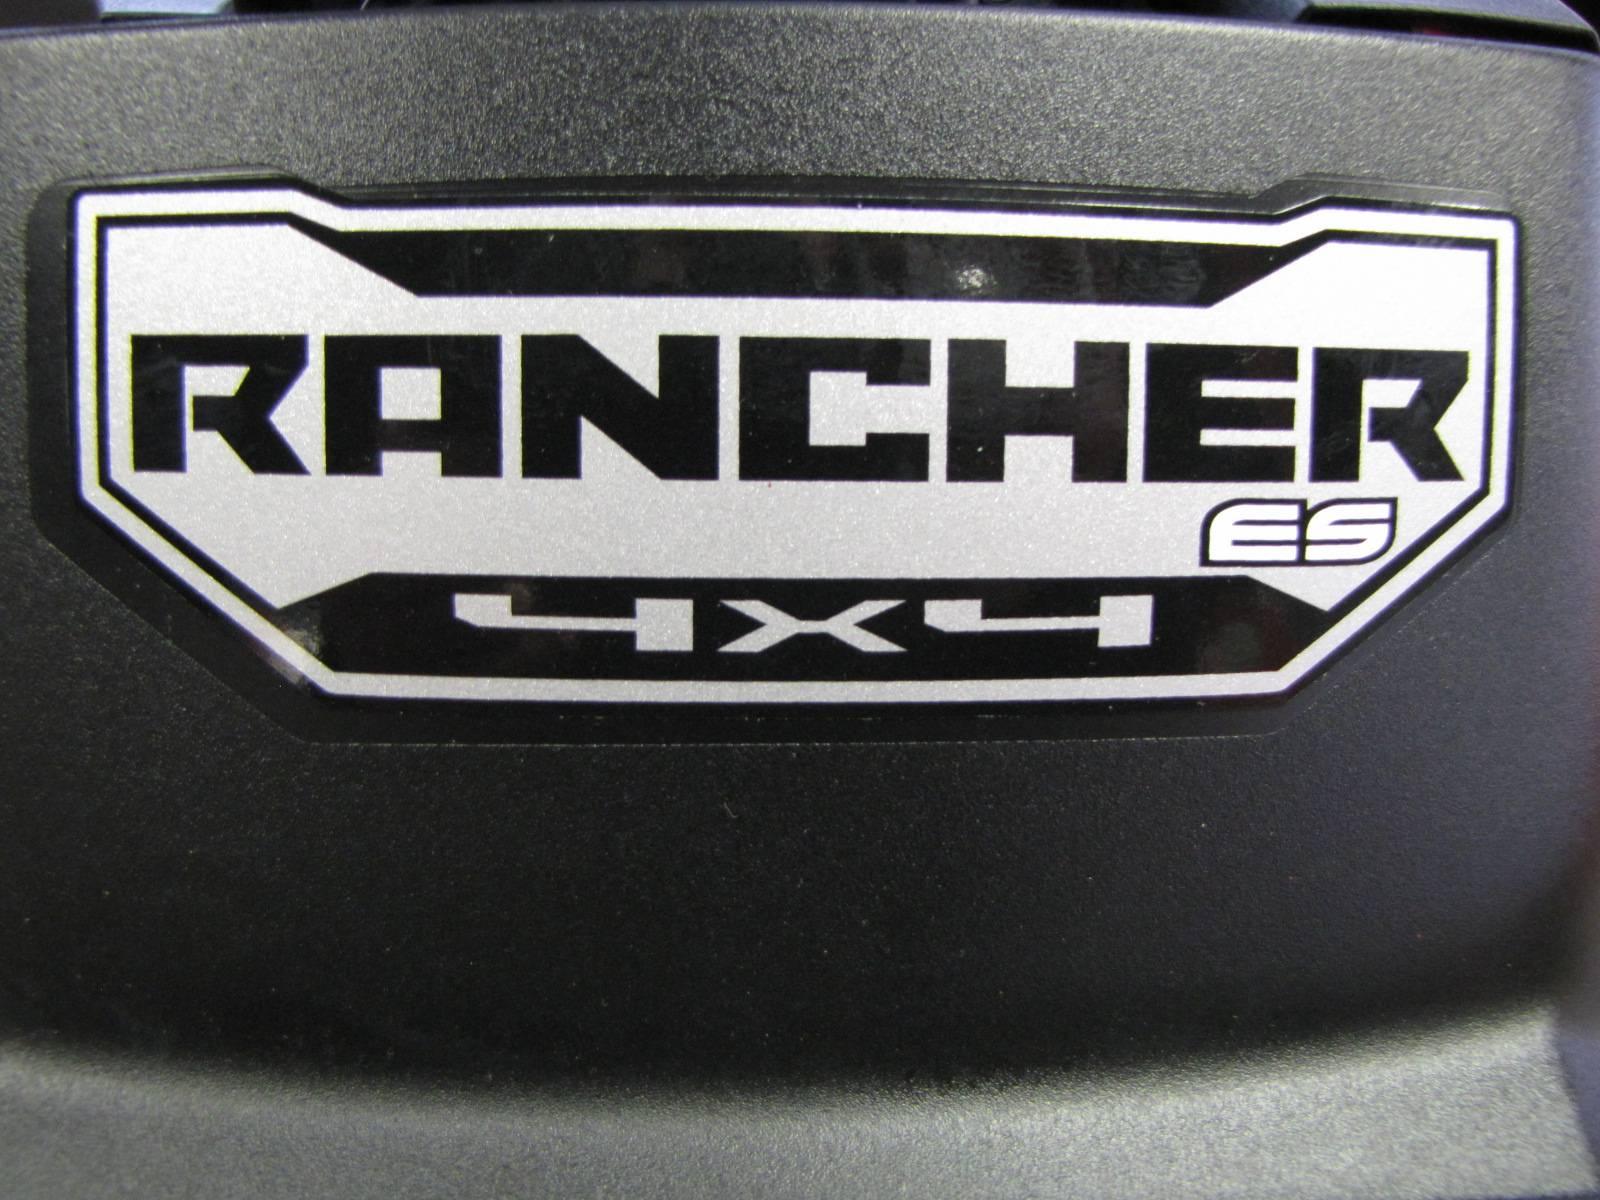 2017 FourTrax Rancher 4x4 ES